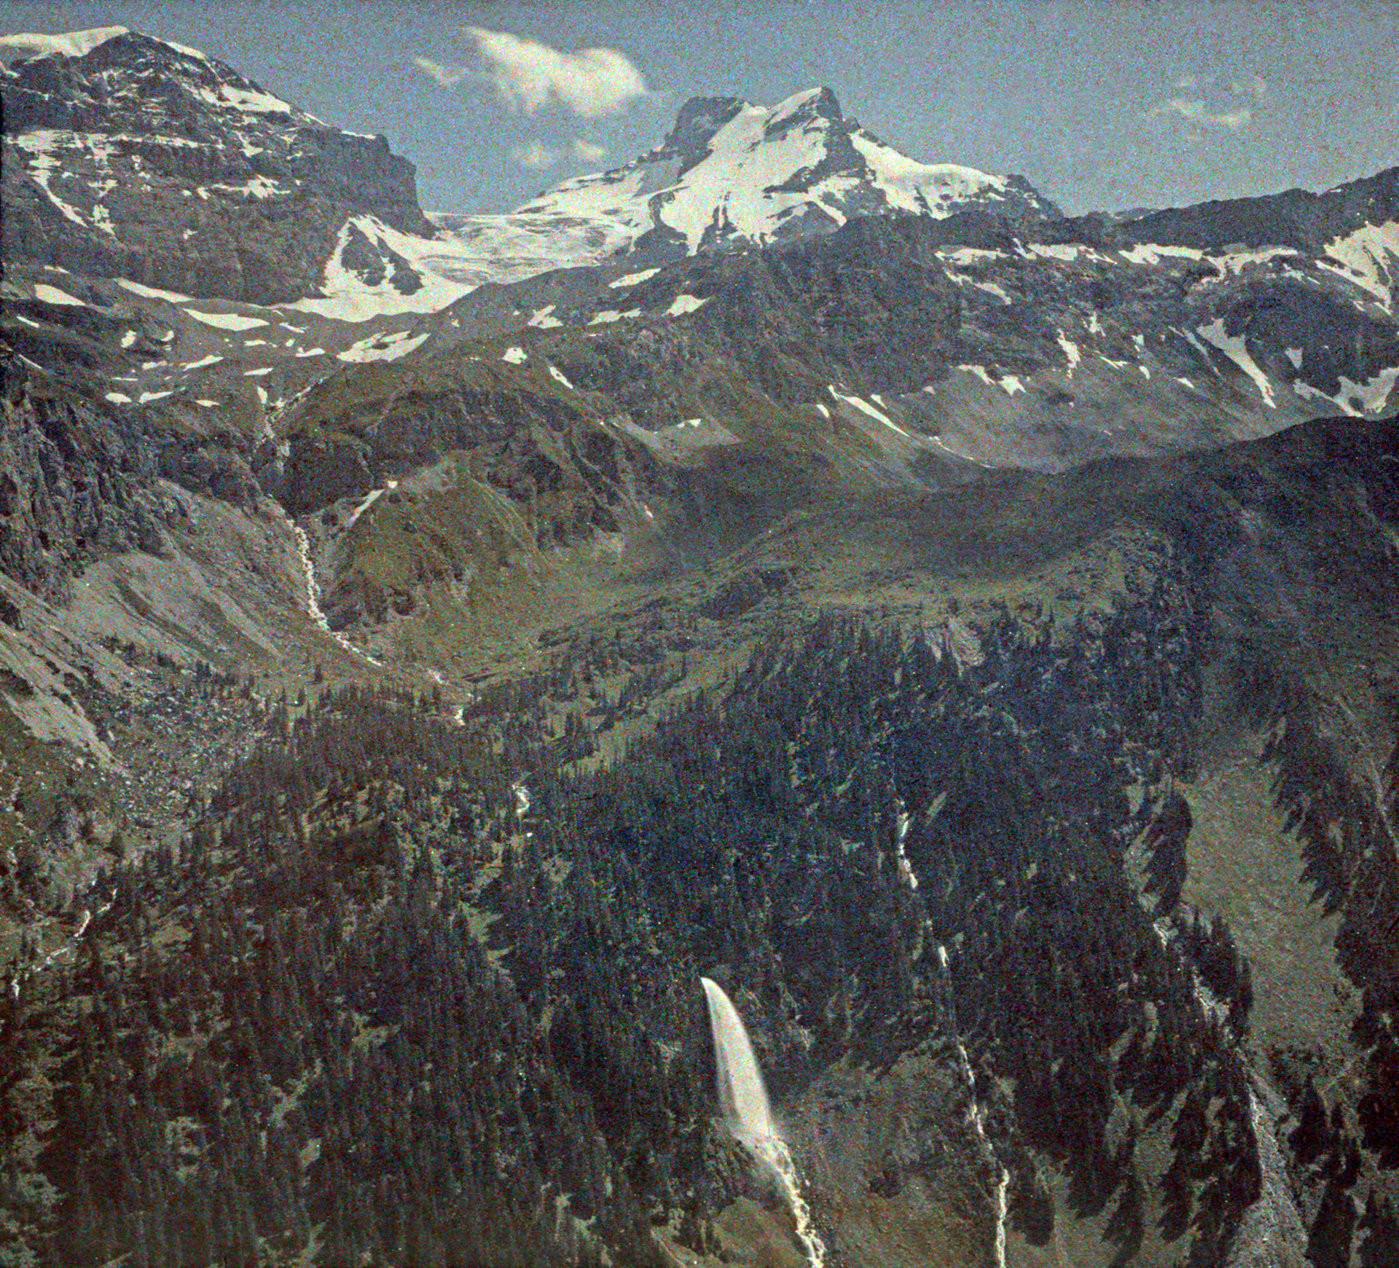 Staubifall, Clariden en 1927